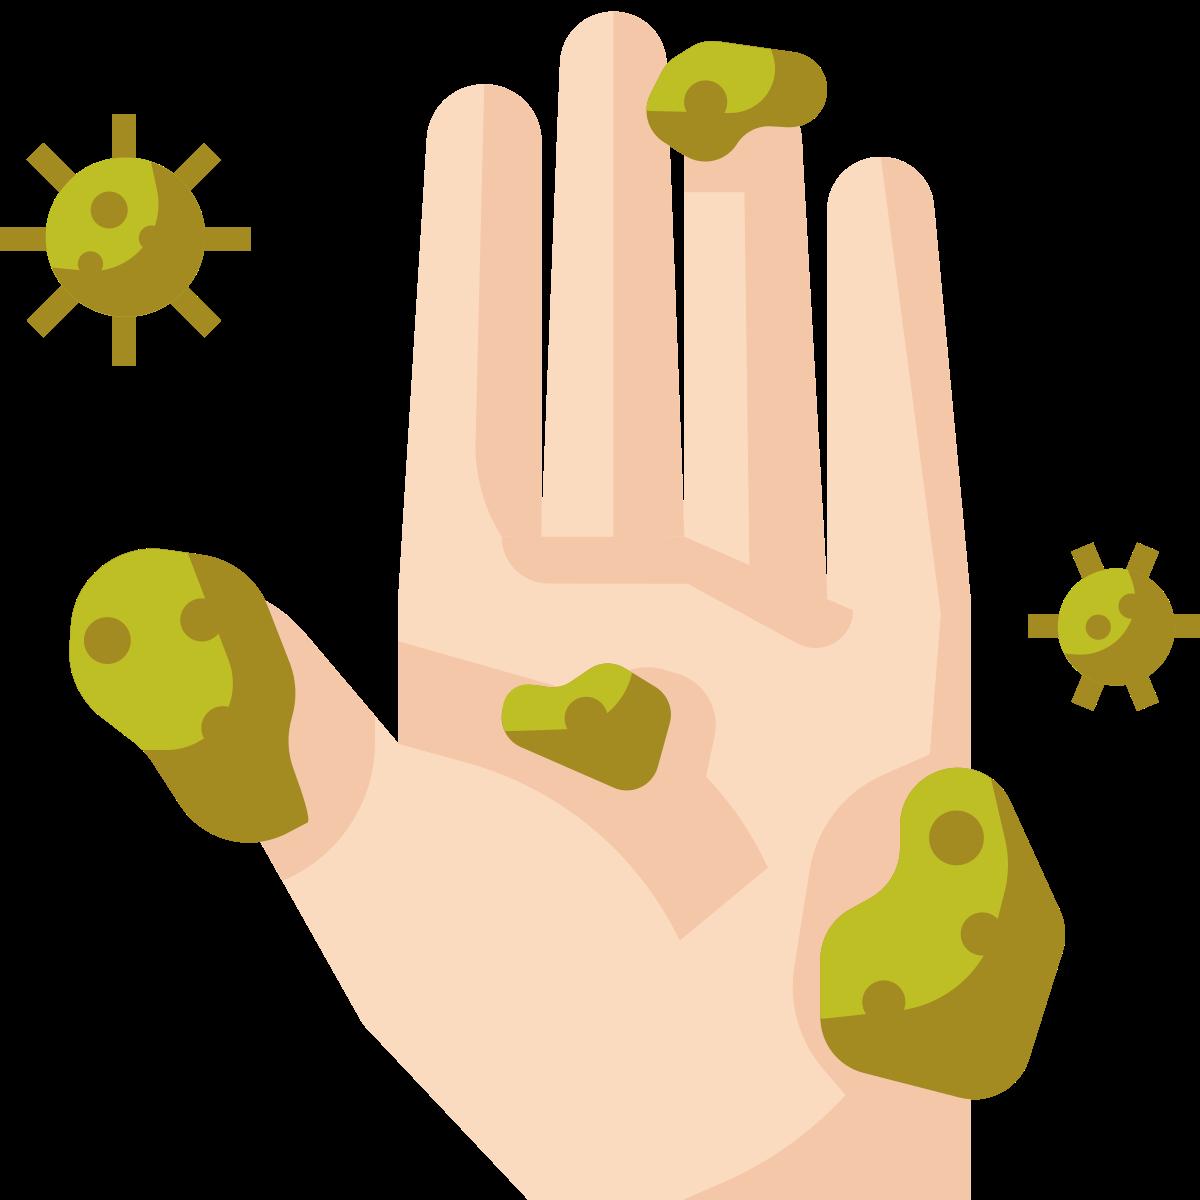 coronavirus  health  dirty hands  sanitized  covid19  wash hands  hygiene icon icon